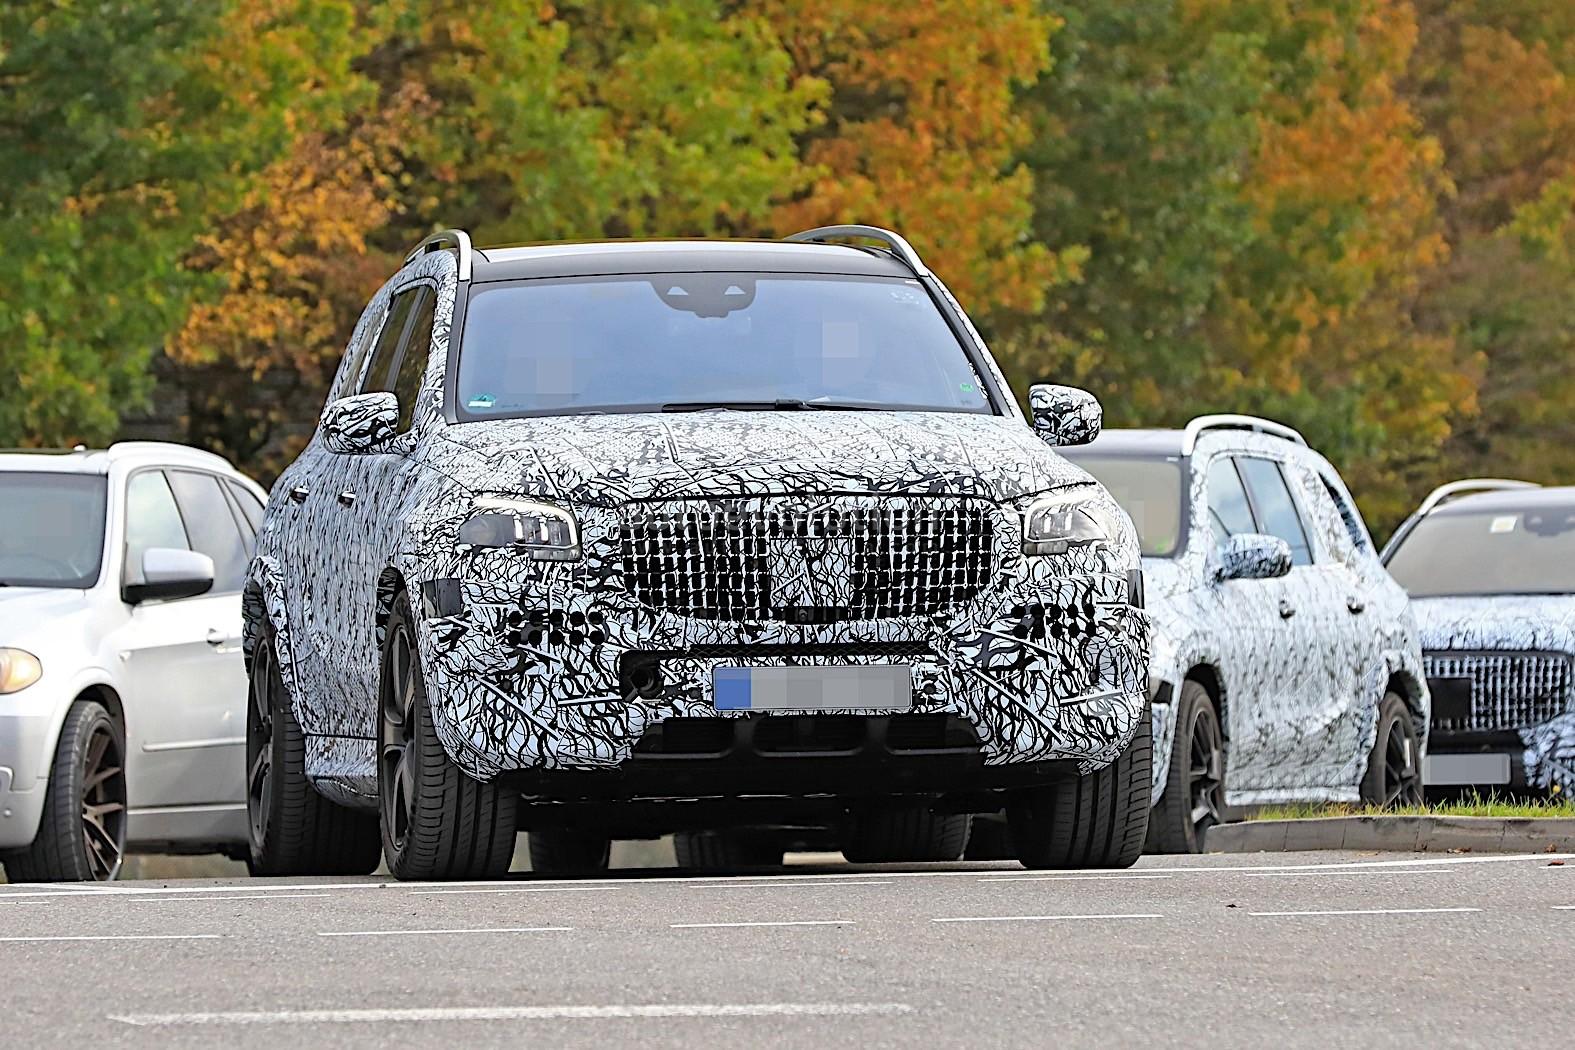 2020 Mercedes Maybach Gls Meets Mercedes Benz Gls In Rare